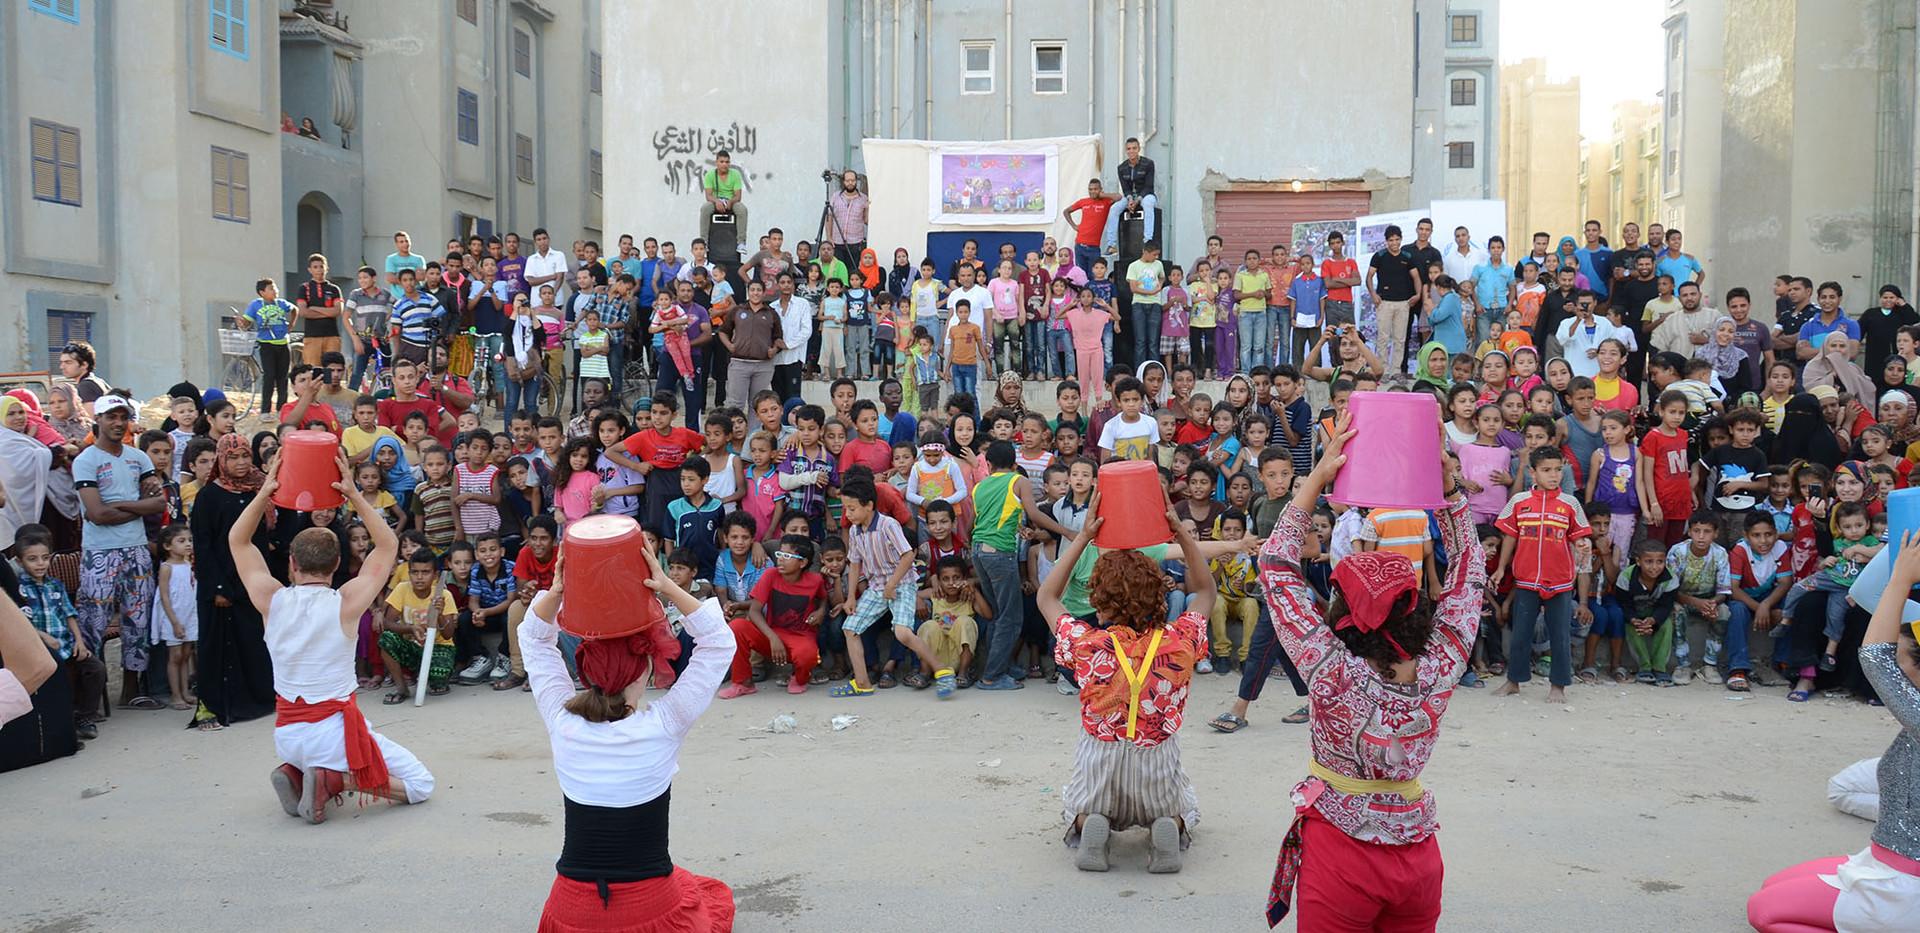 Art performances in the public open space